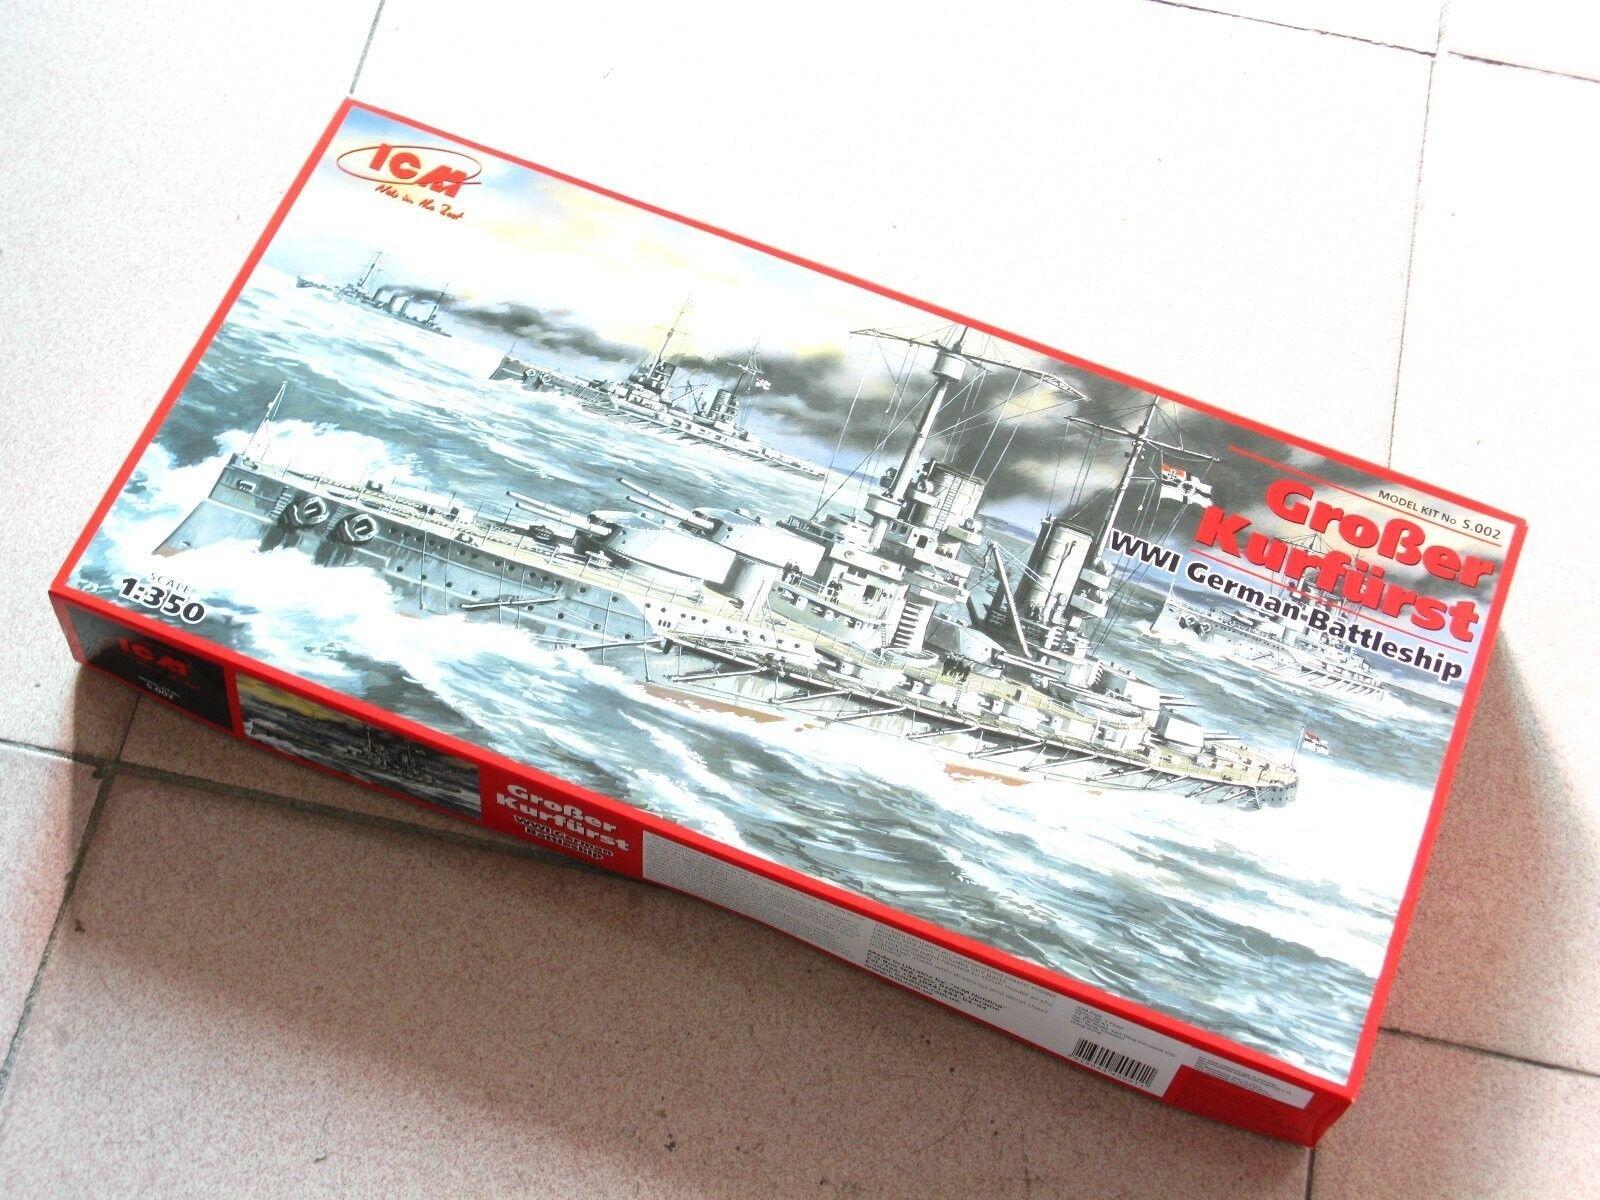 ICM 1 350  S002 WWI German Battleship GroBer Kurfurst